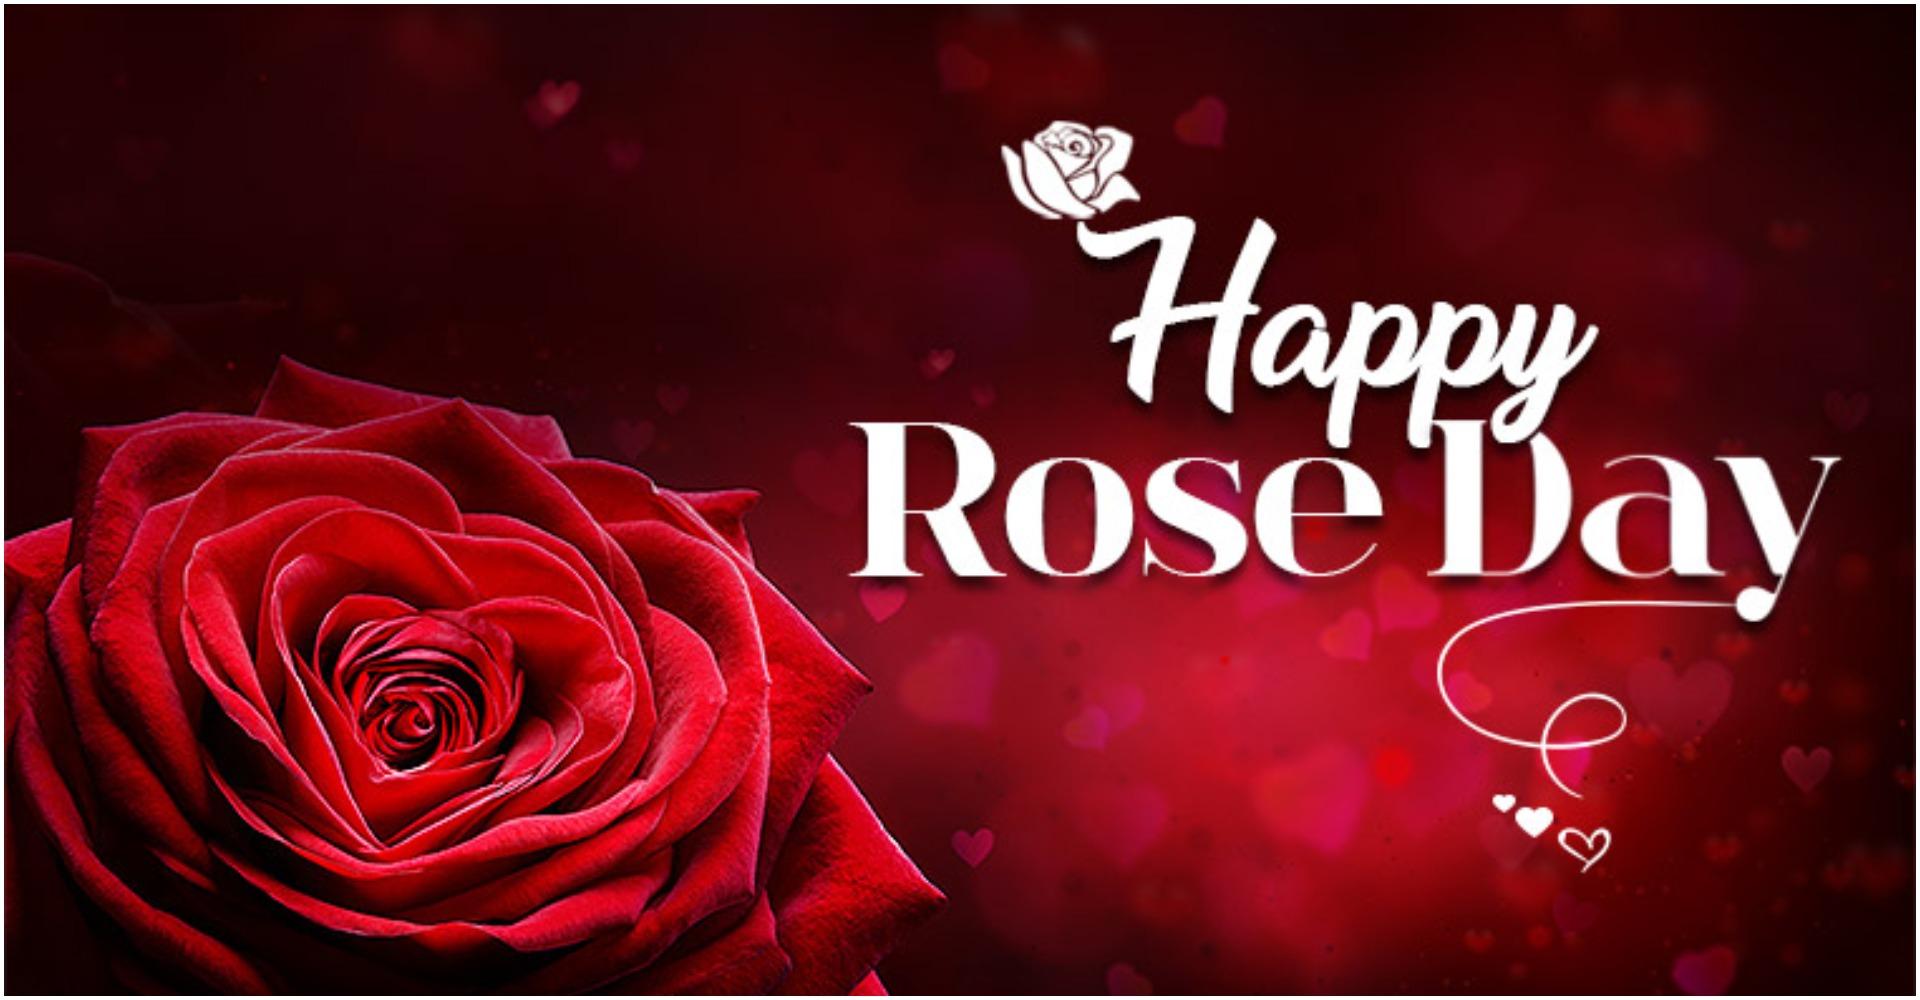 Happy-Rose-Day-2020